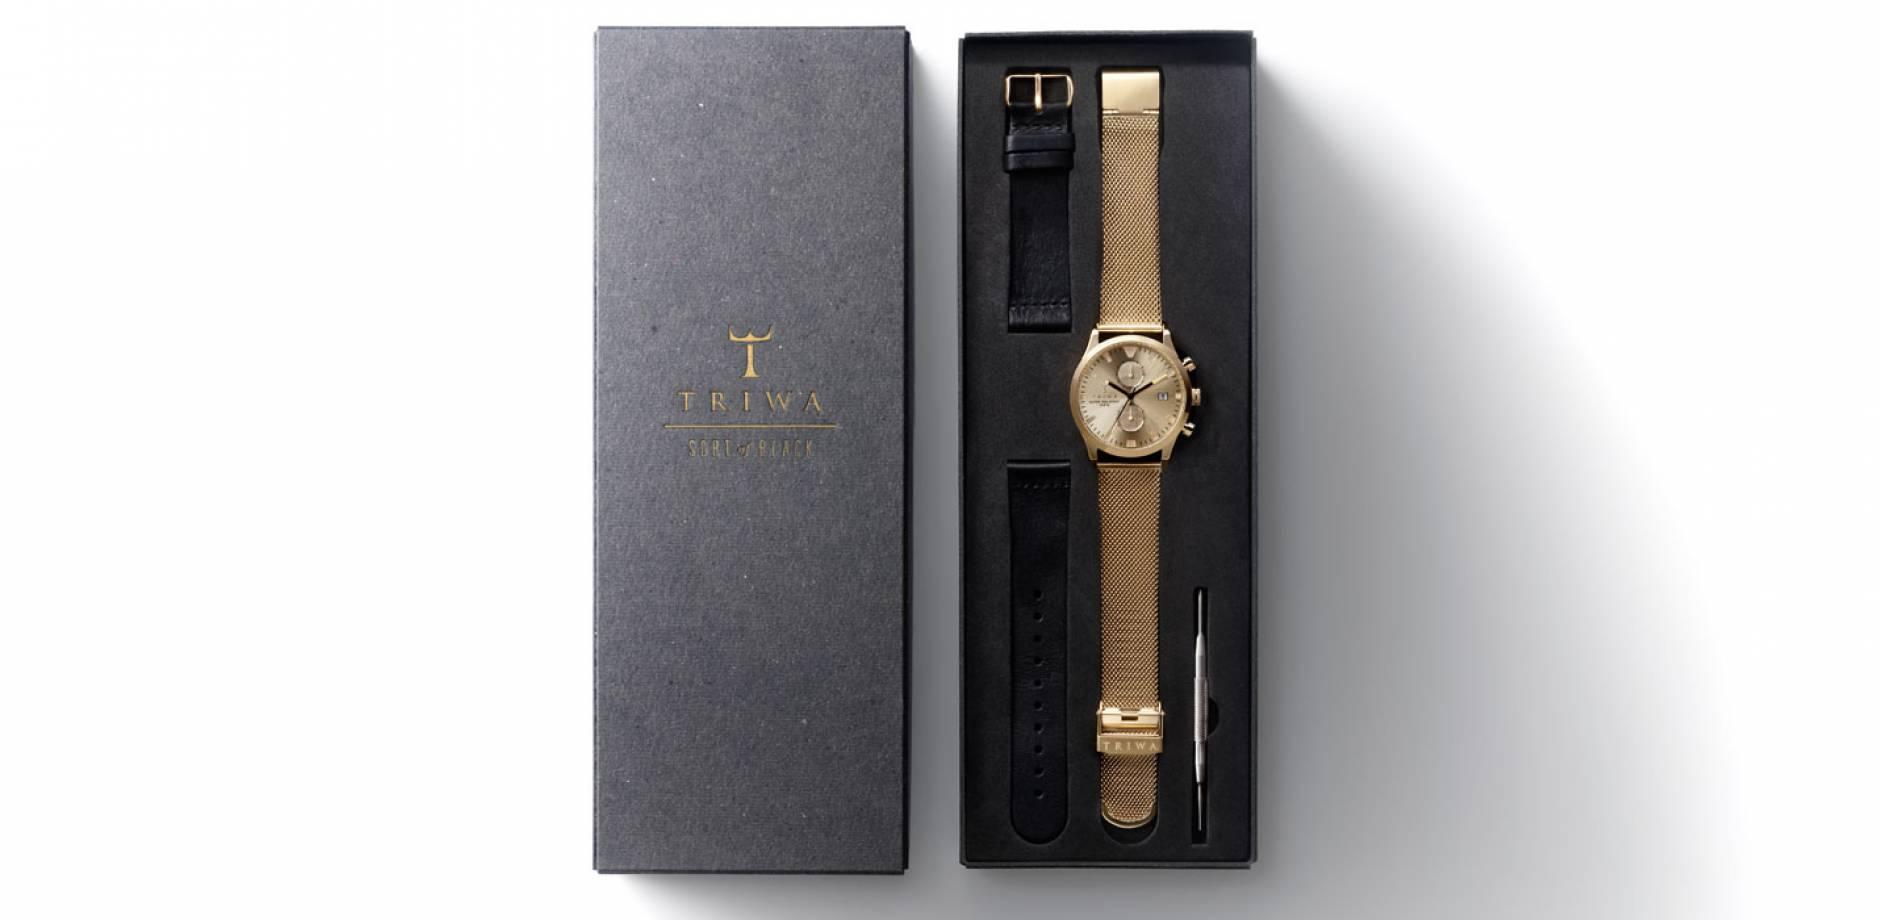 TRIWA - Watch - Sort of Black Gold Chrono